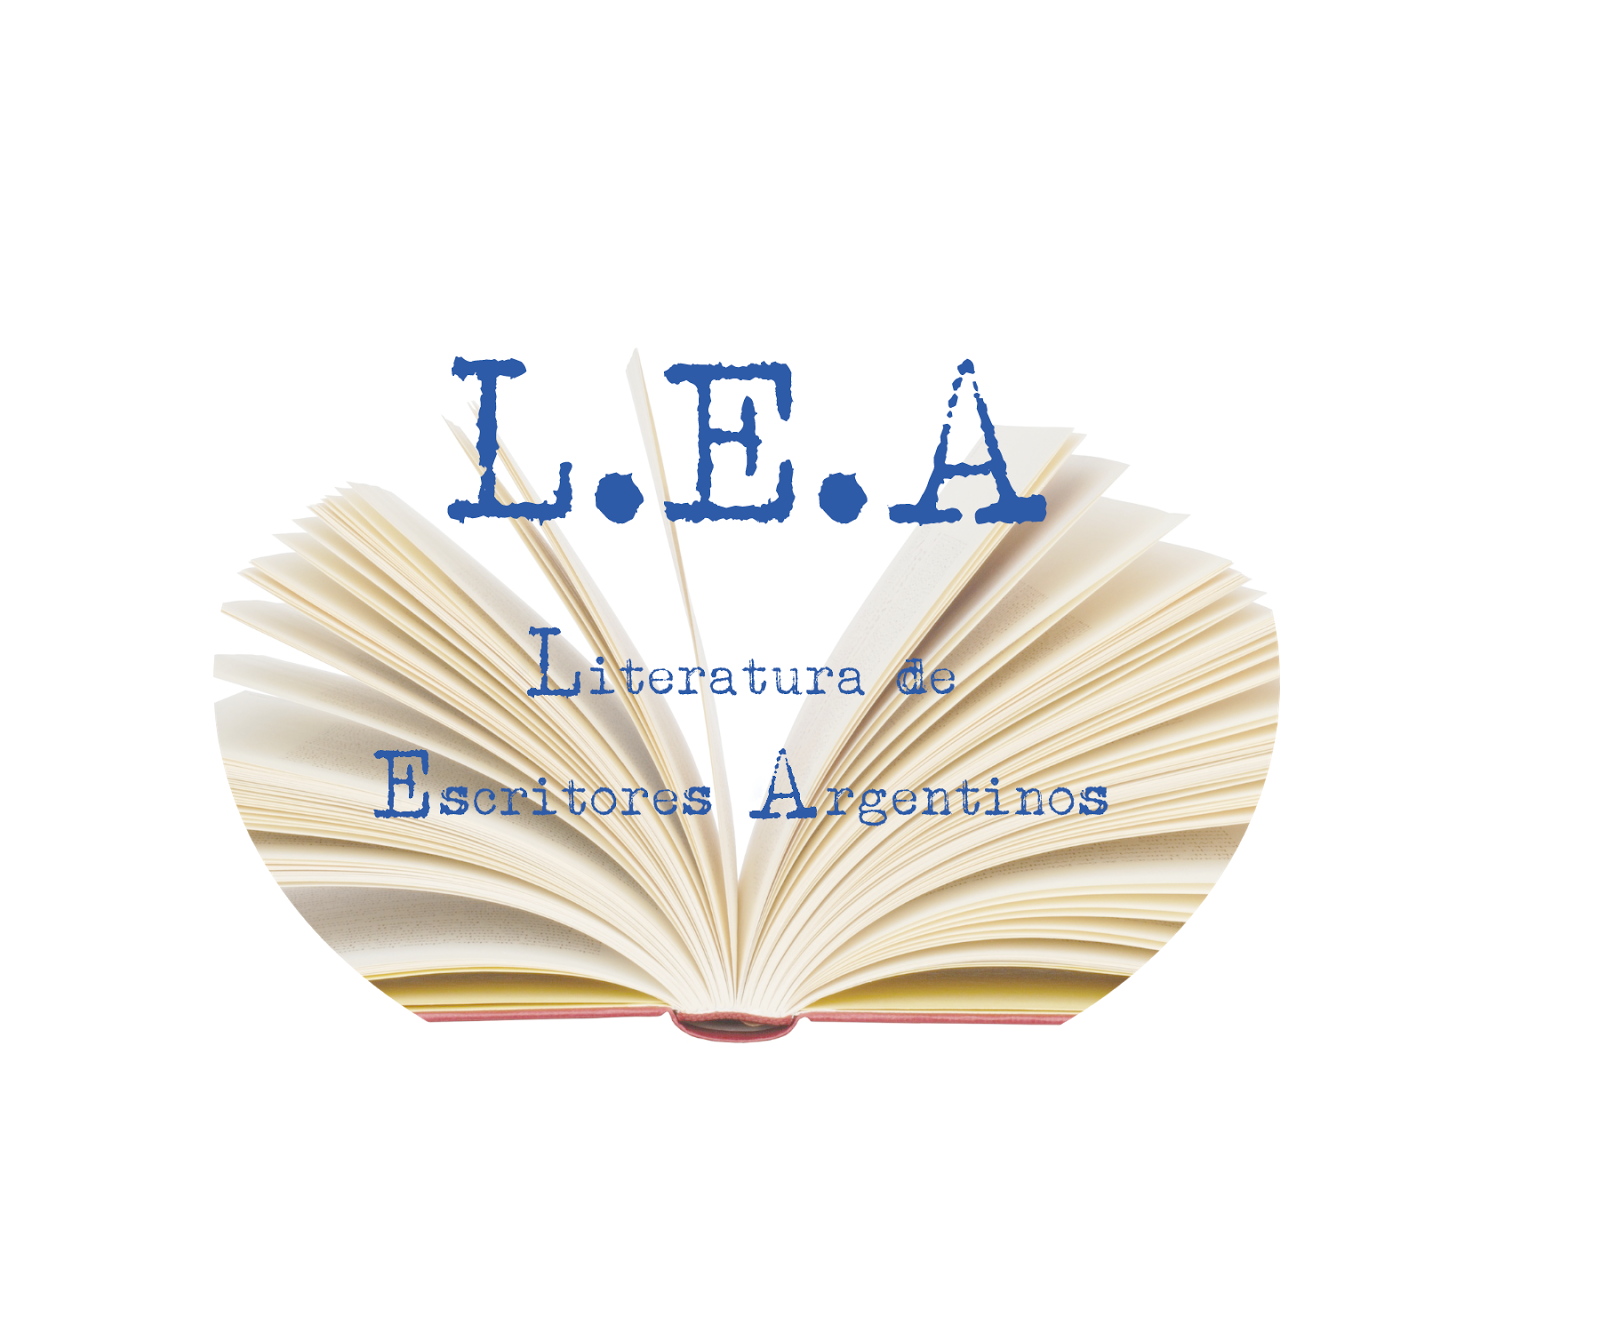 L.E.A. (Literatura de Escritores Argentinos)